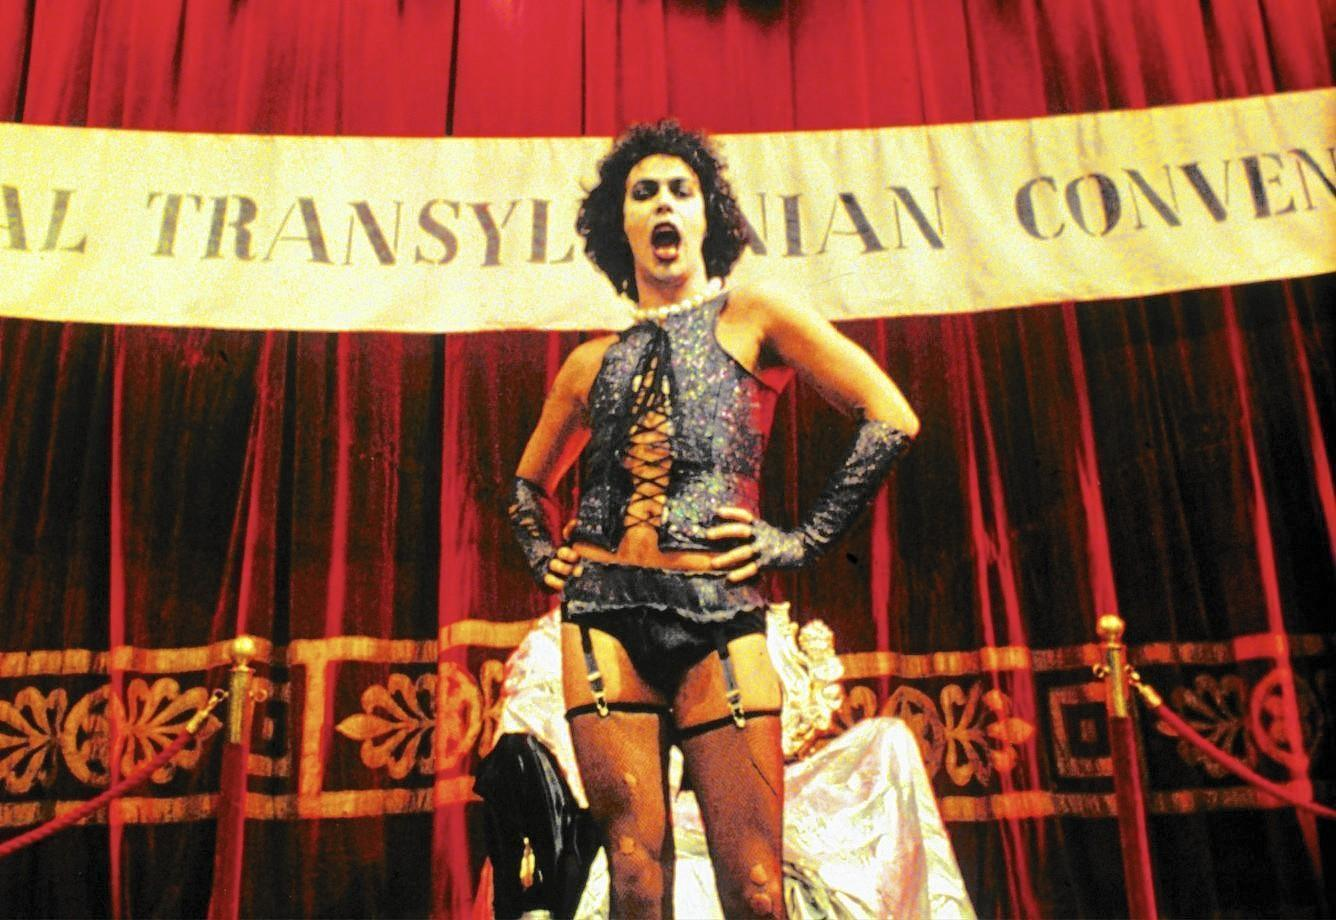 Transsexual transylvania lyrics by iron